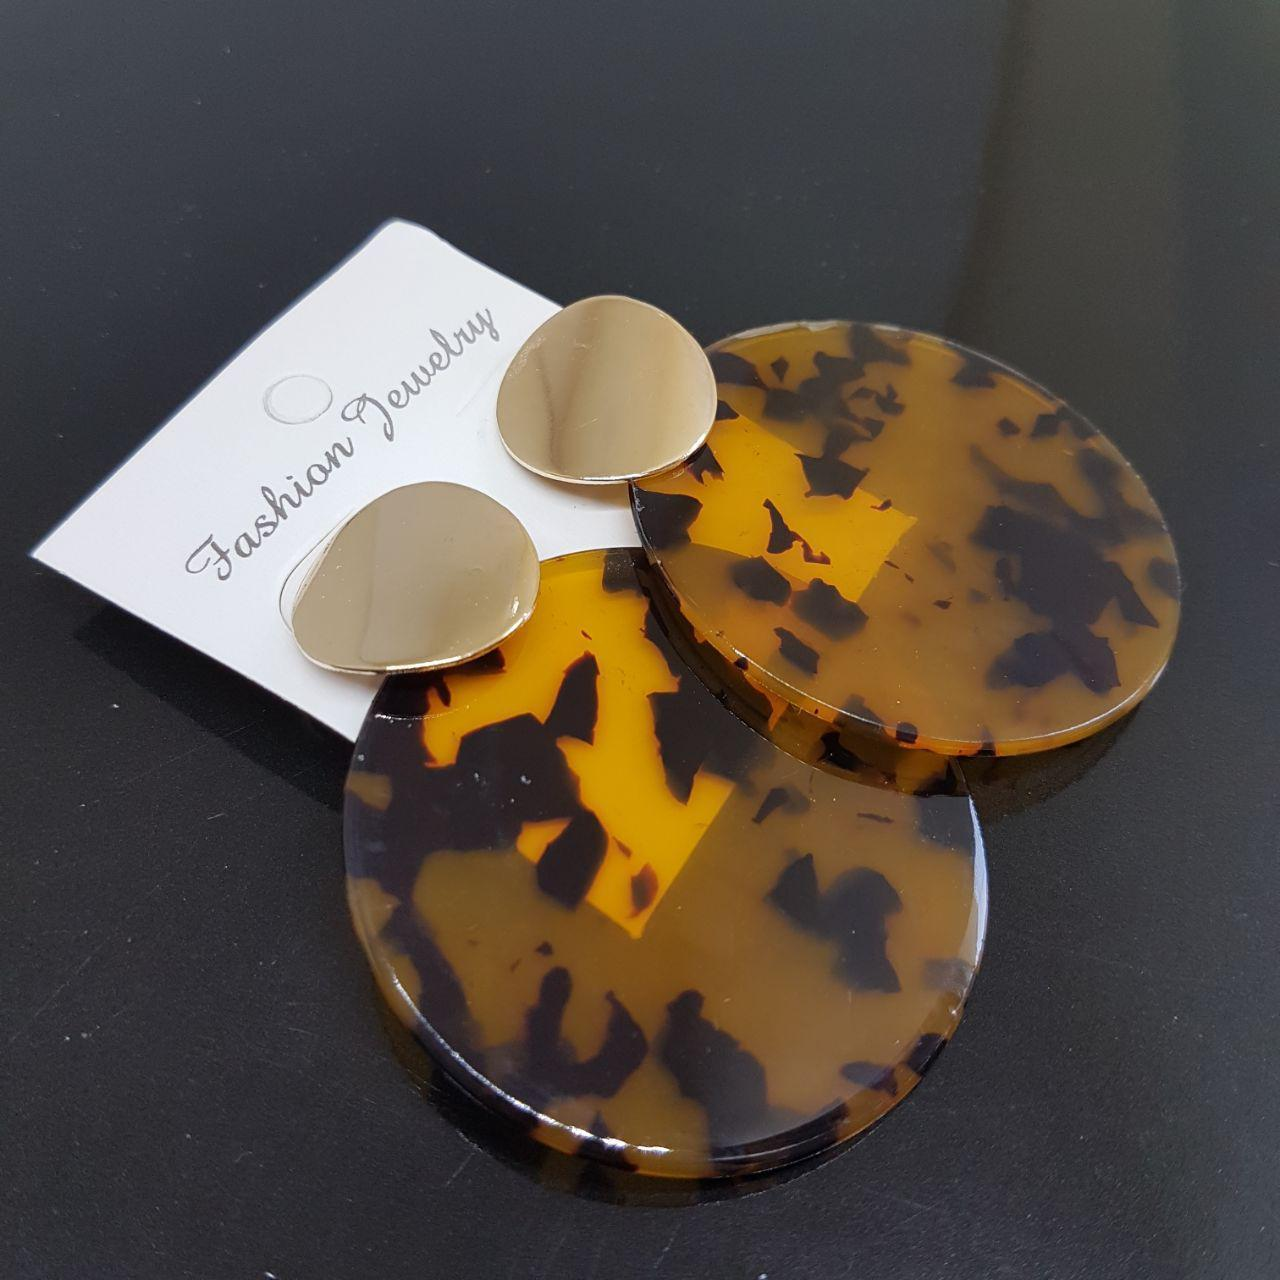 Серьги женские Mexico Fashion Jewelry янтарный с черным 50mm (арт. ear-mexico-amber-black)